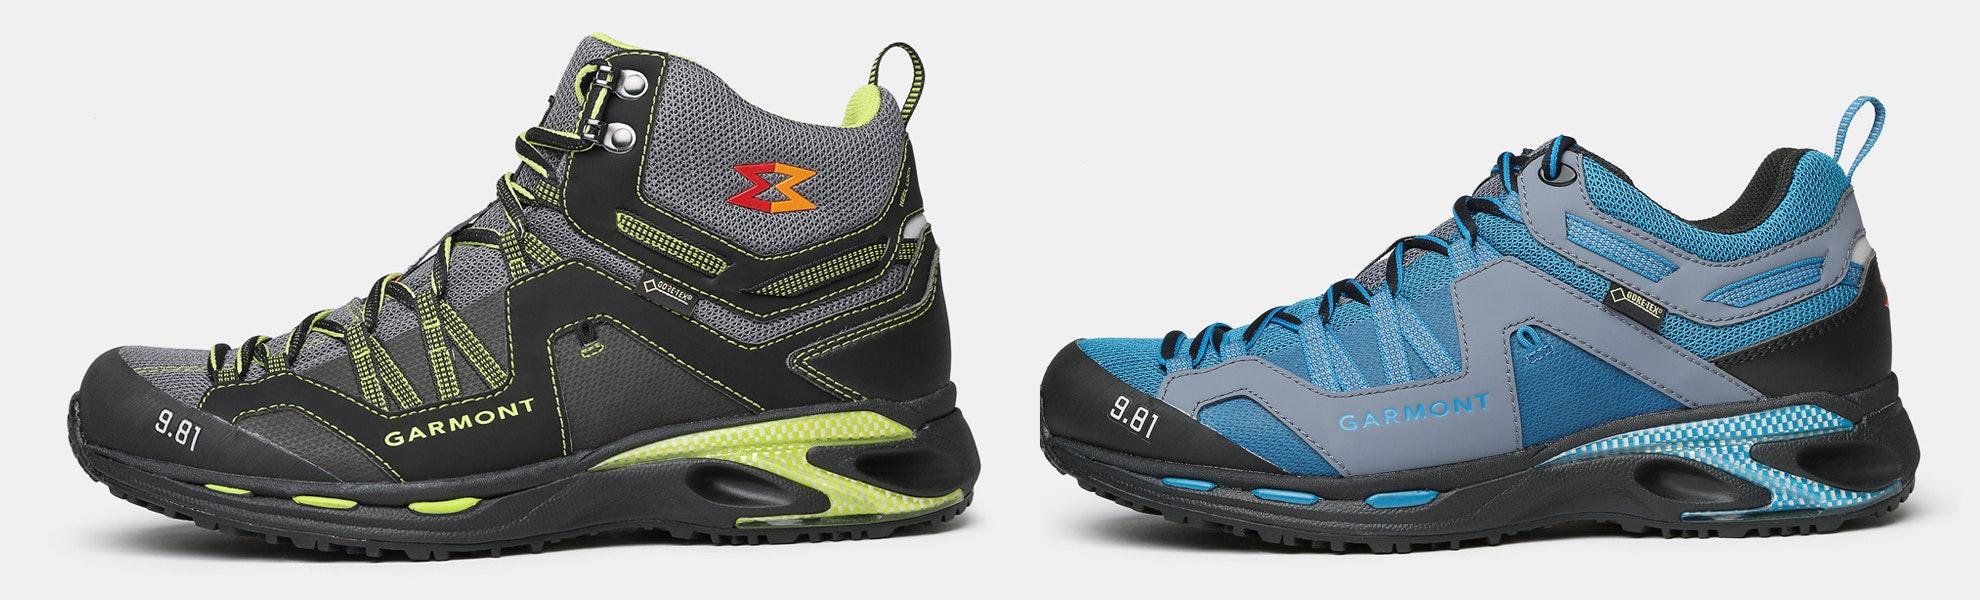 Garmont Men's Trail Pro II GTX Hiking Shoes